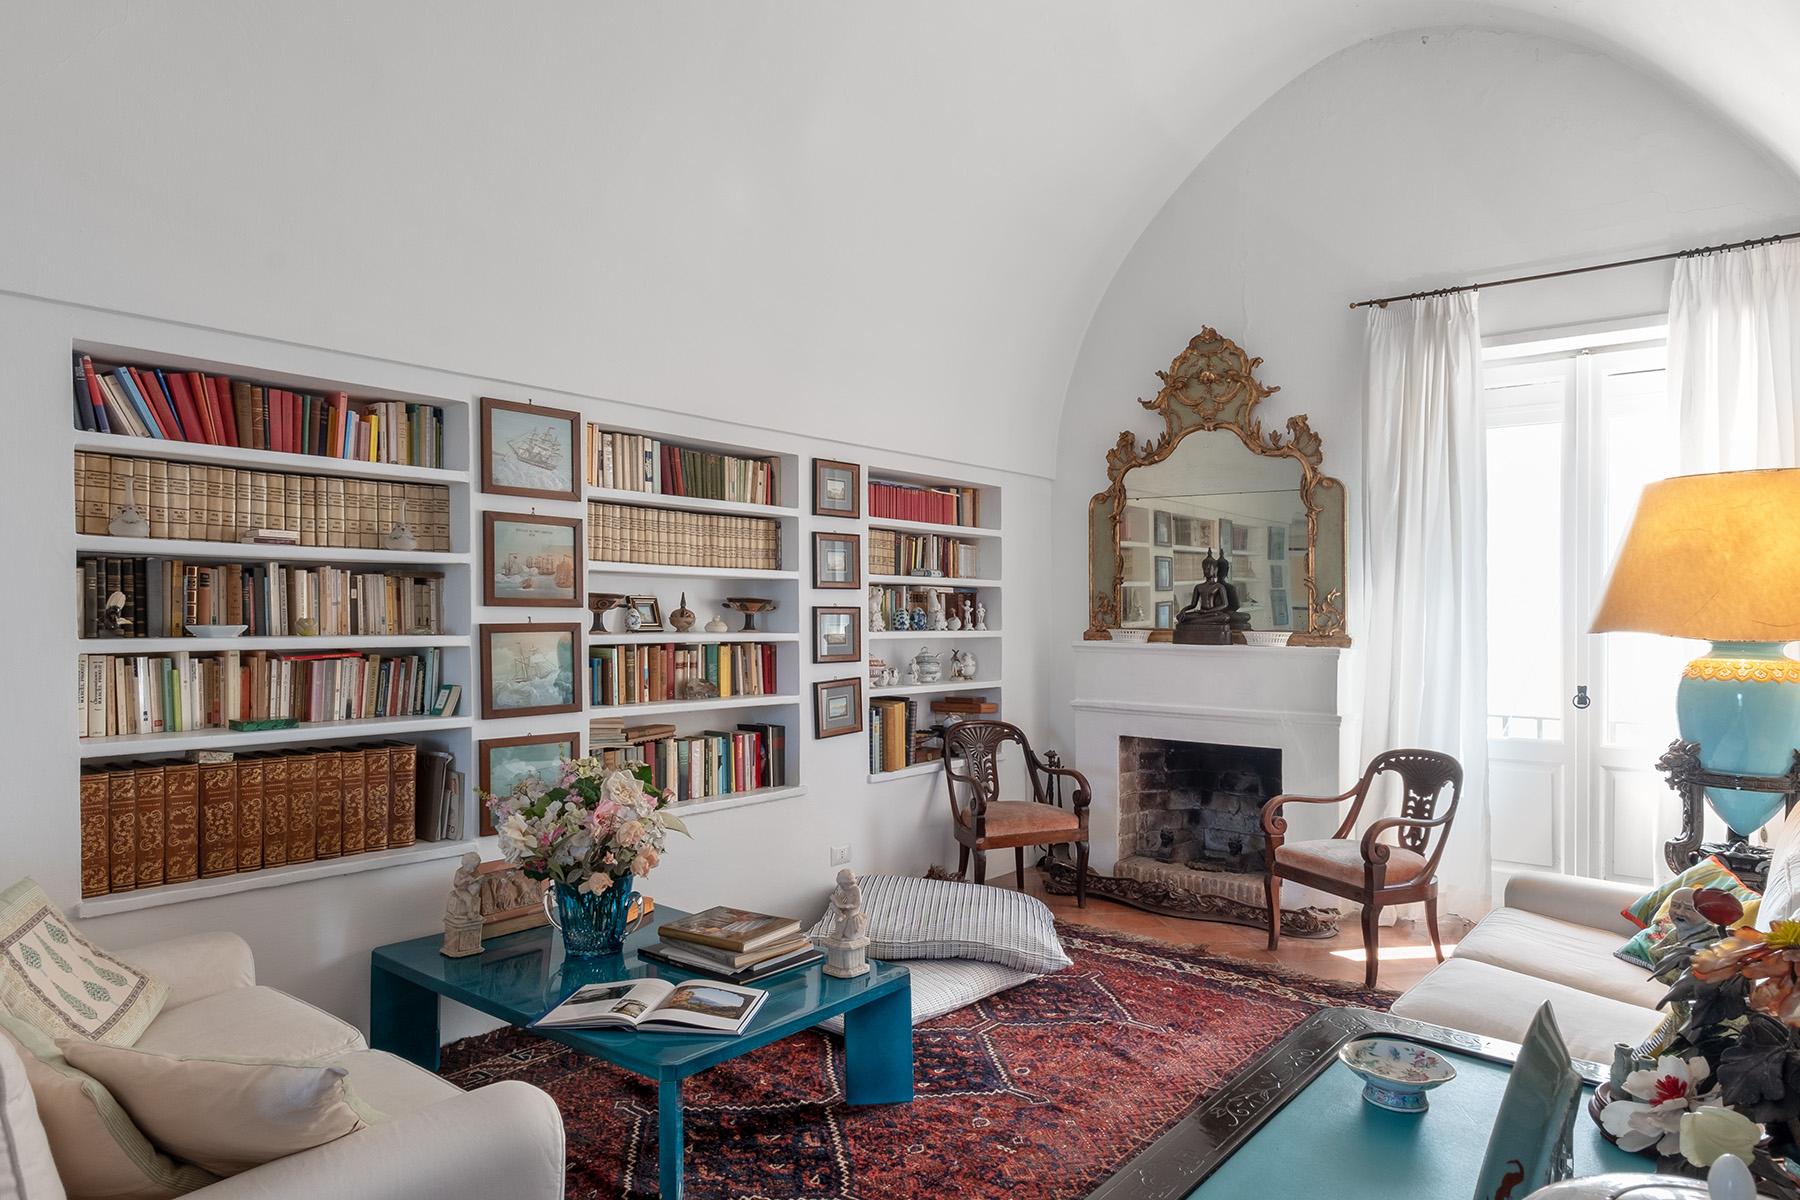 Casa indipendente in Vendita a Capri: 5 locali, 300 mq - Foto 14